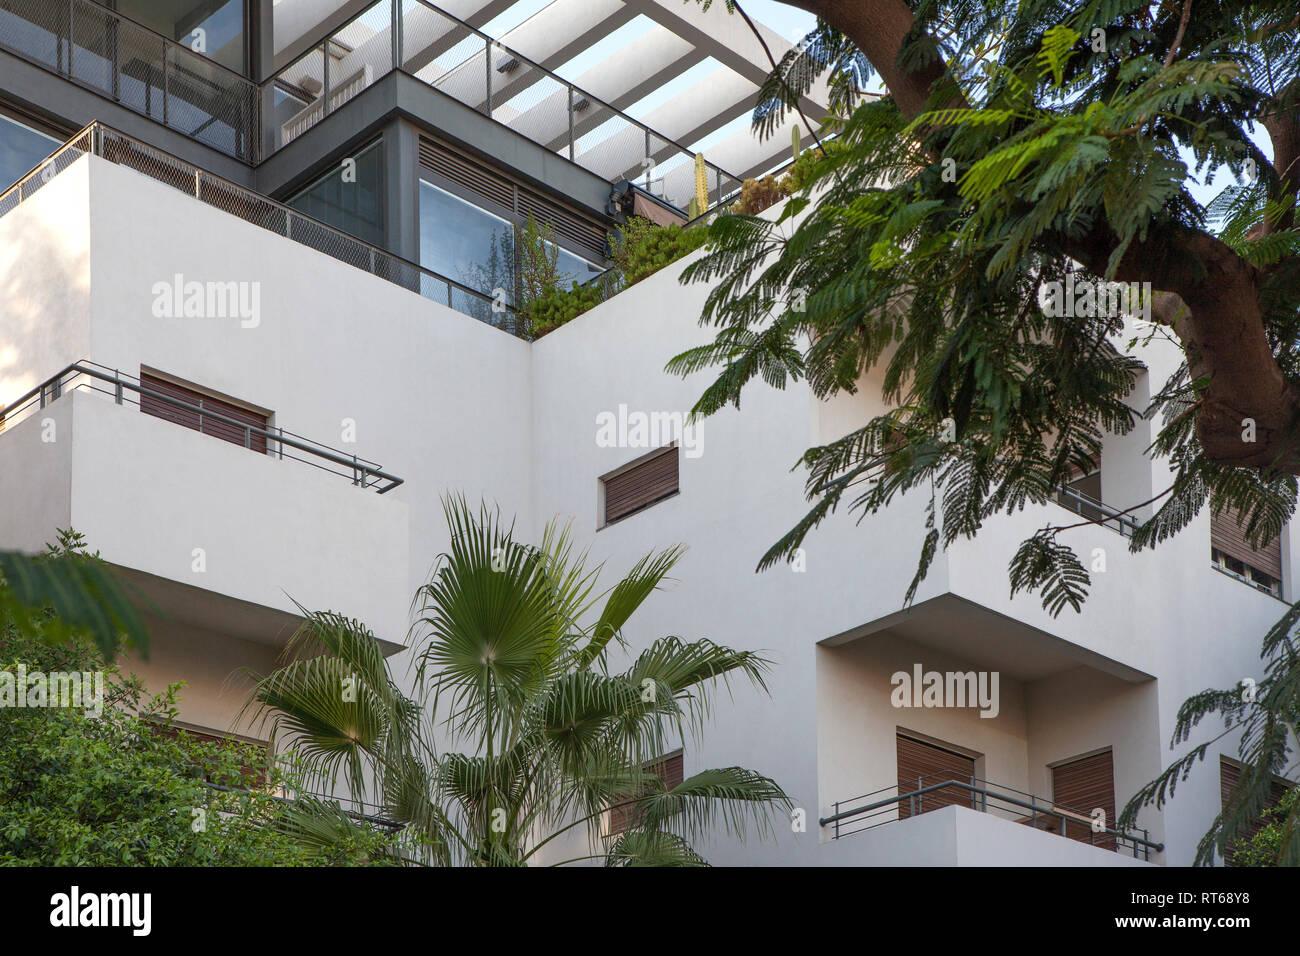 Israel, Tel Aviv, White City, Rothschild Boulevard, Bauhaus style - Stock Image